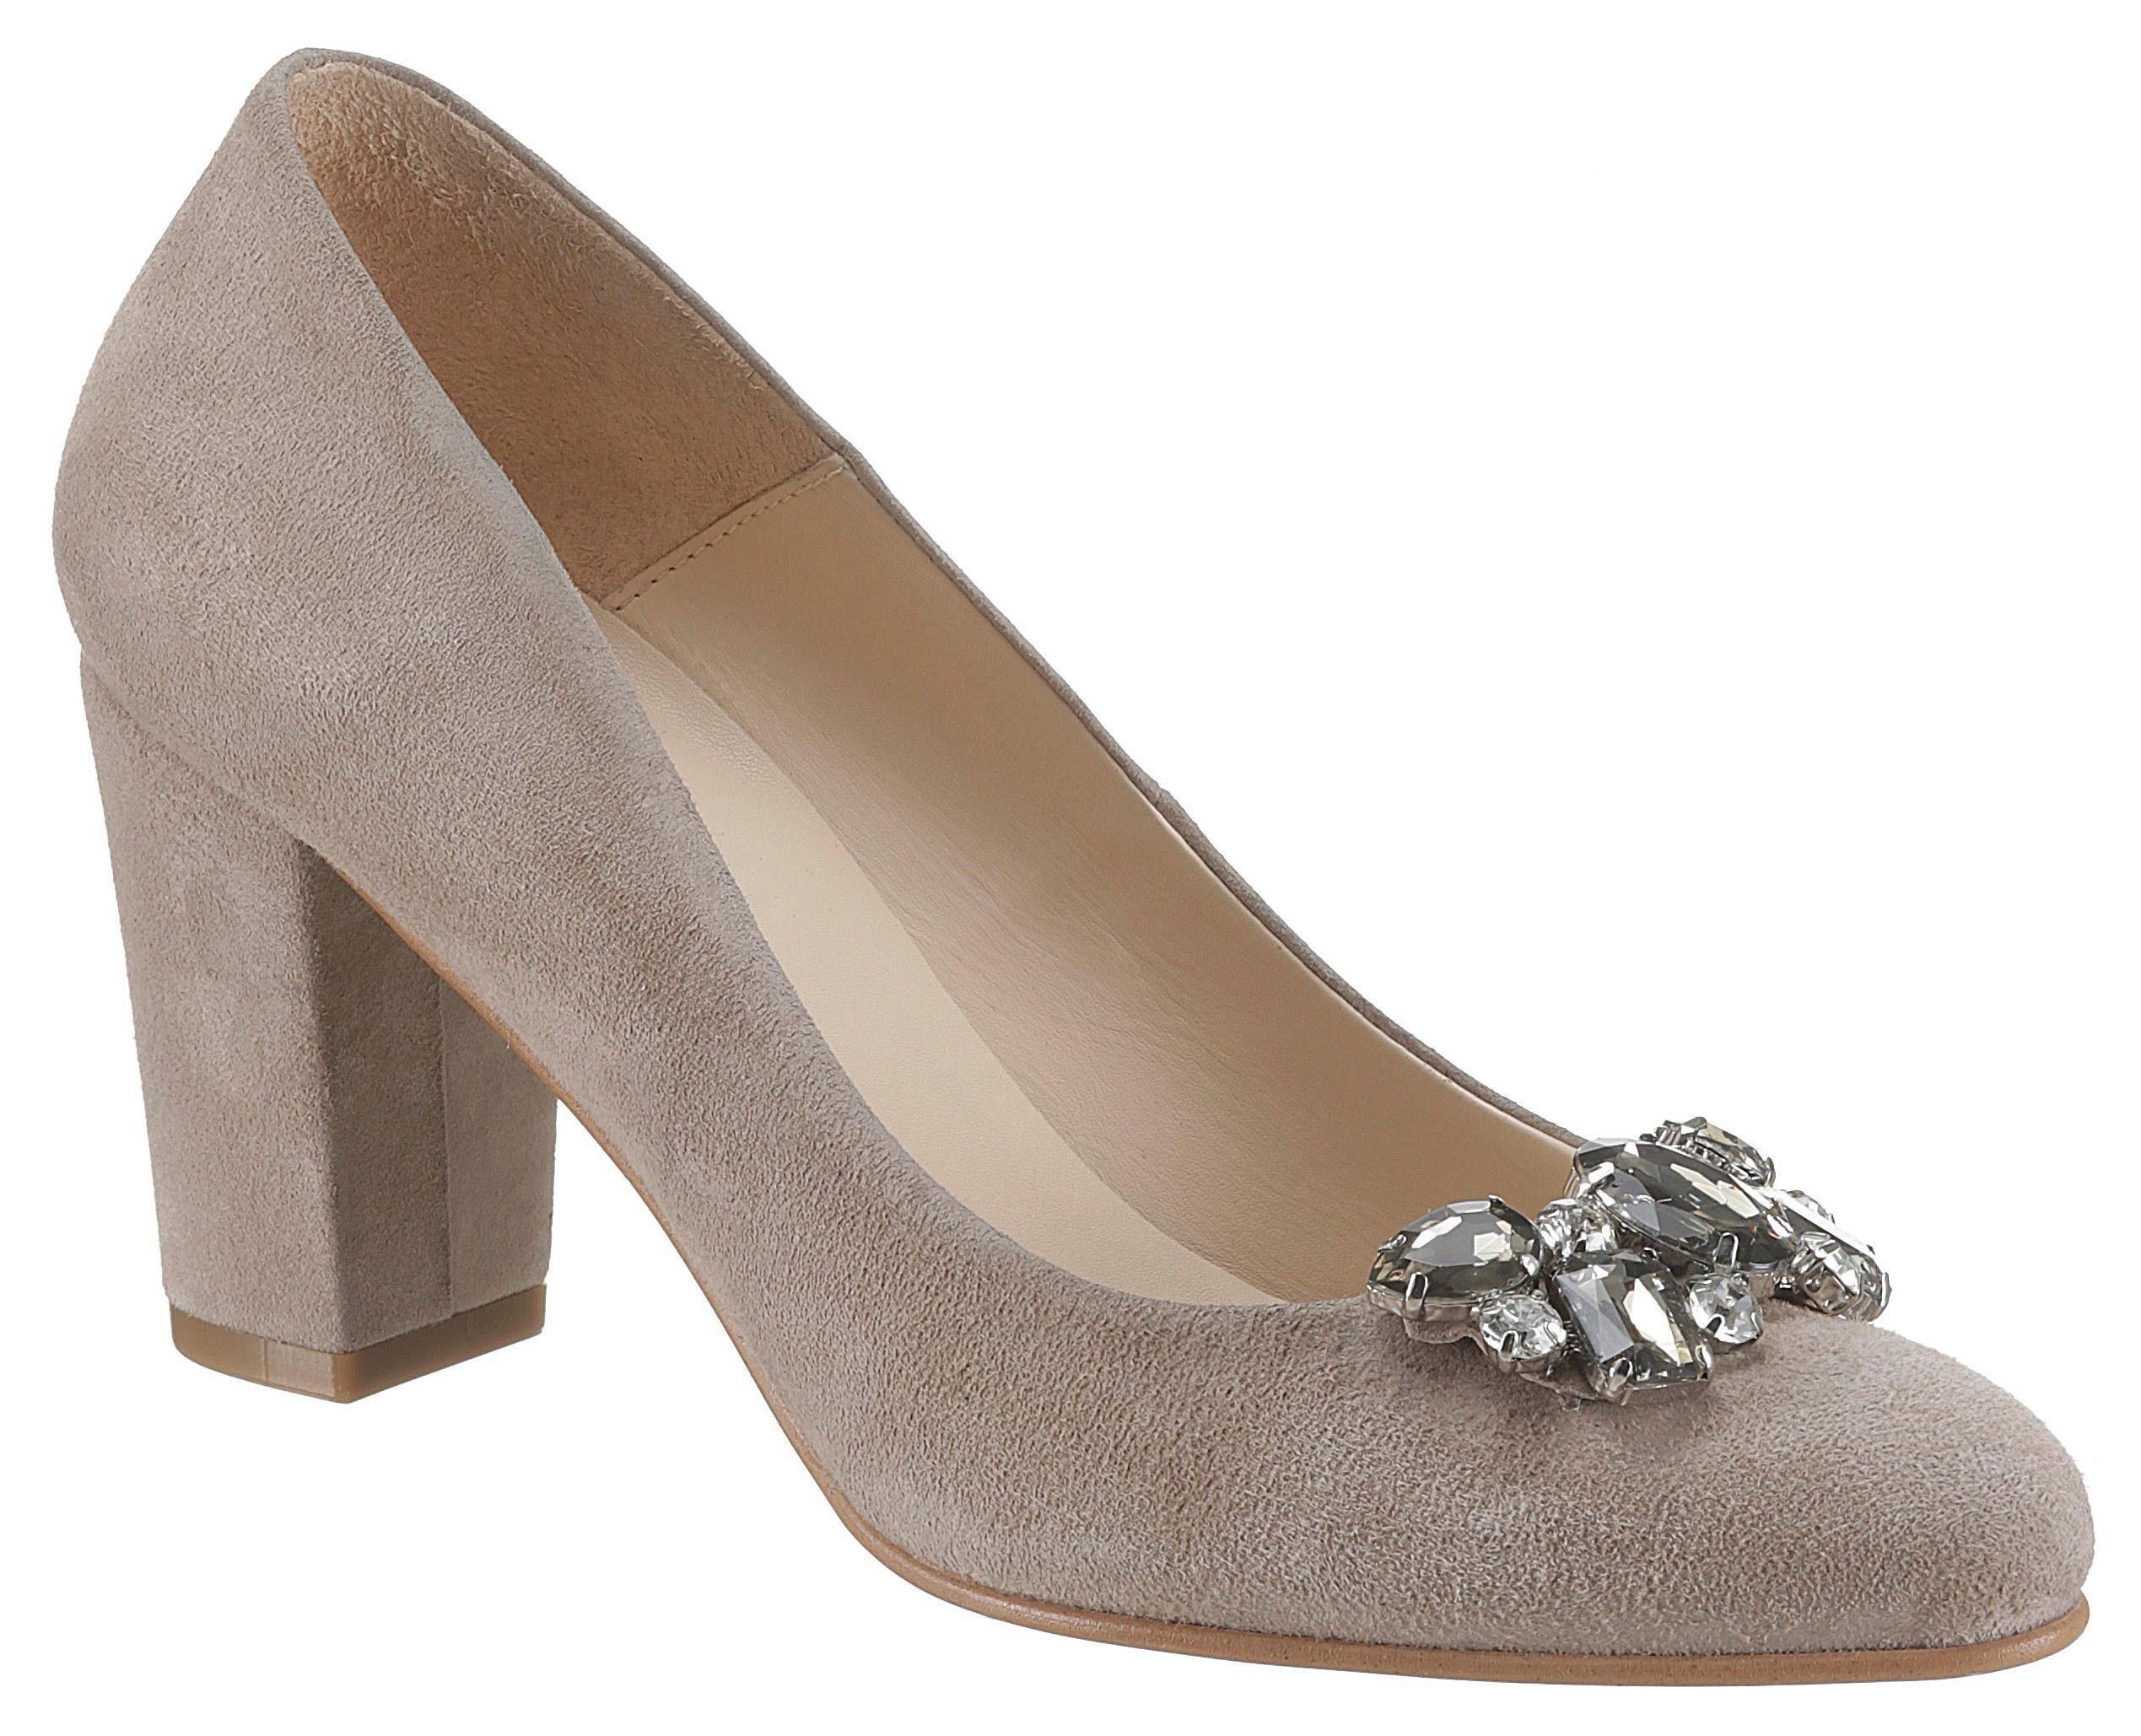 Betty Barclay Shoes Pumps mit eleganter Schmuckapplikation